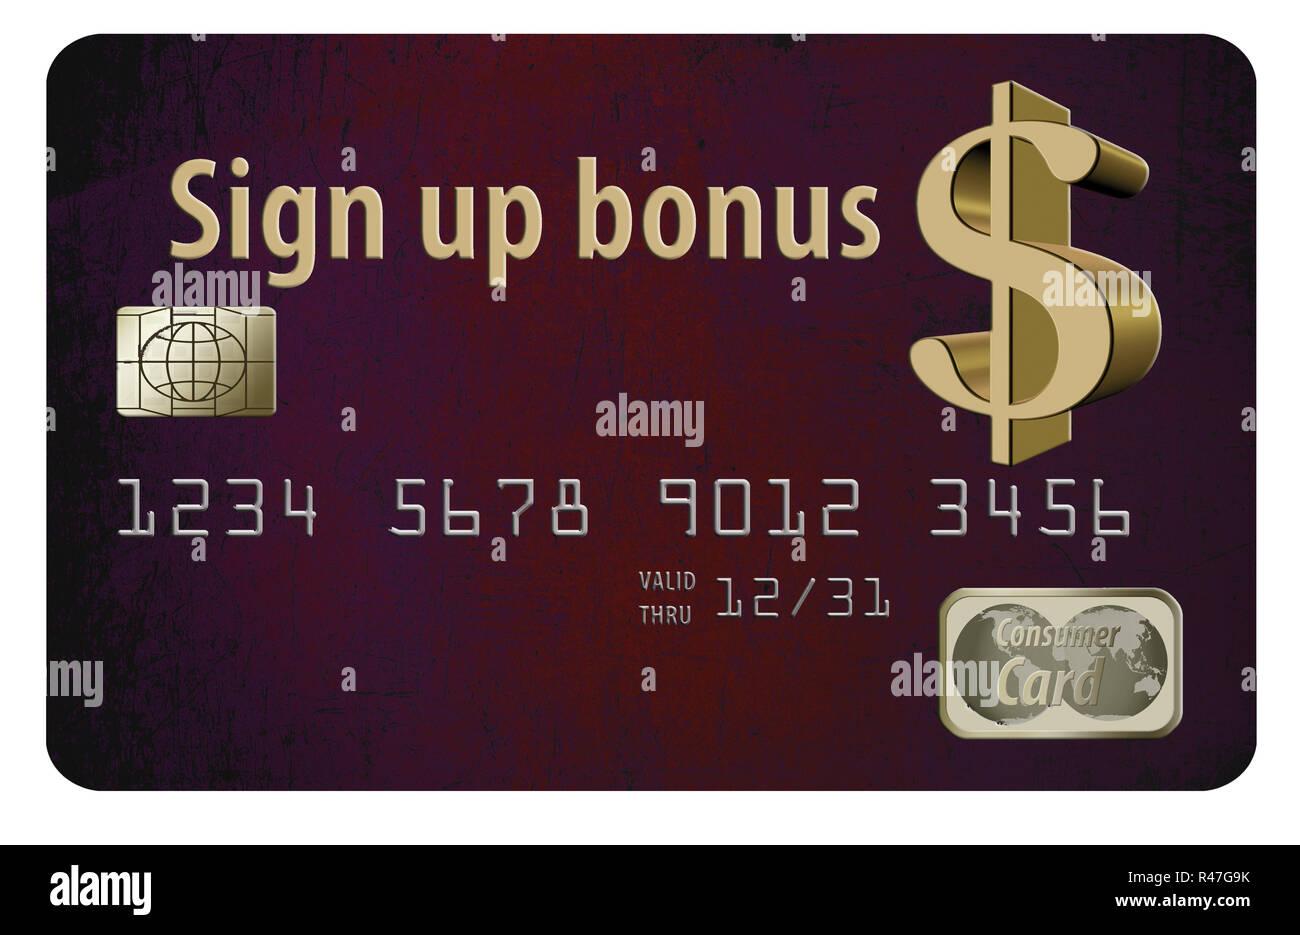 Seven Taboos About Credit Card Sign Up Bonus You Should Never Share On Twitter   Credit Card Sign Up Bonus